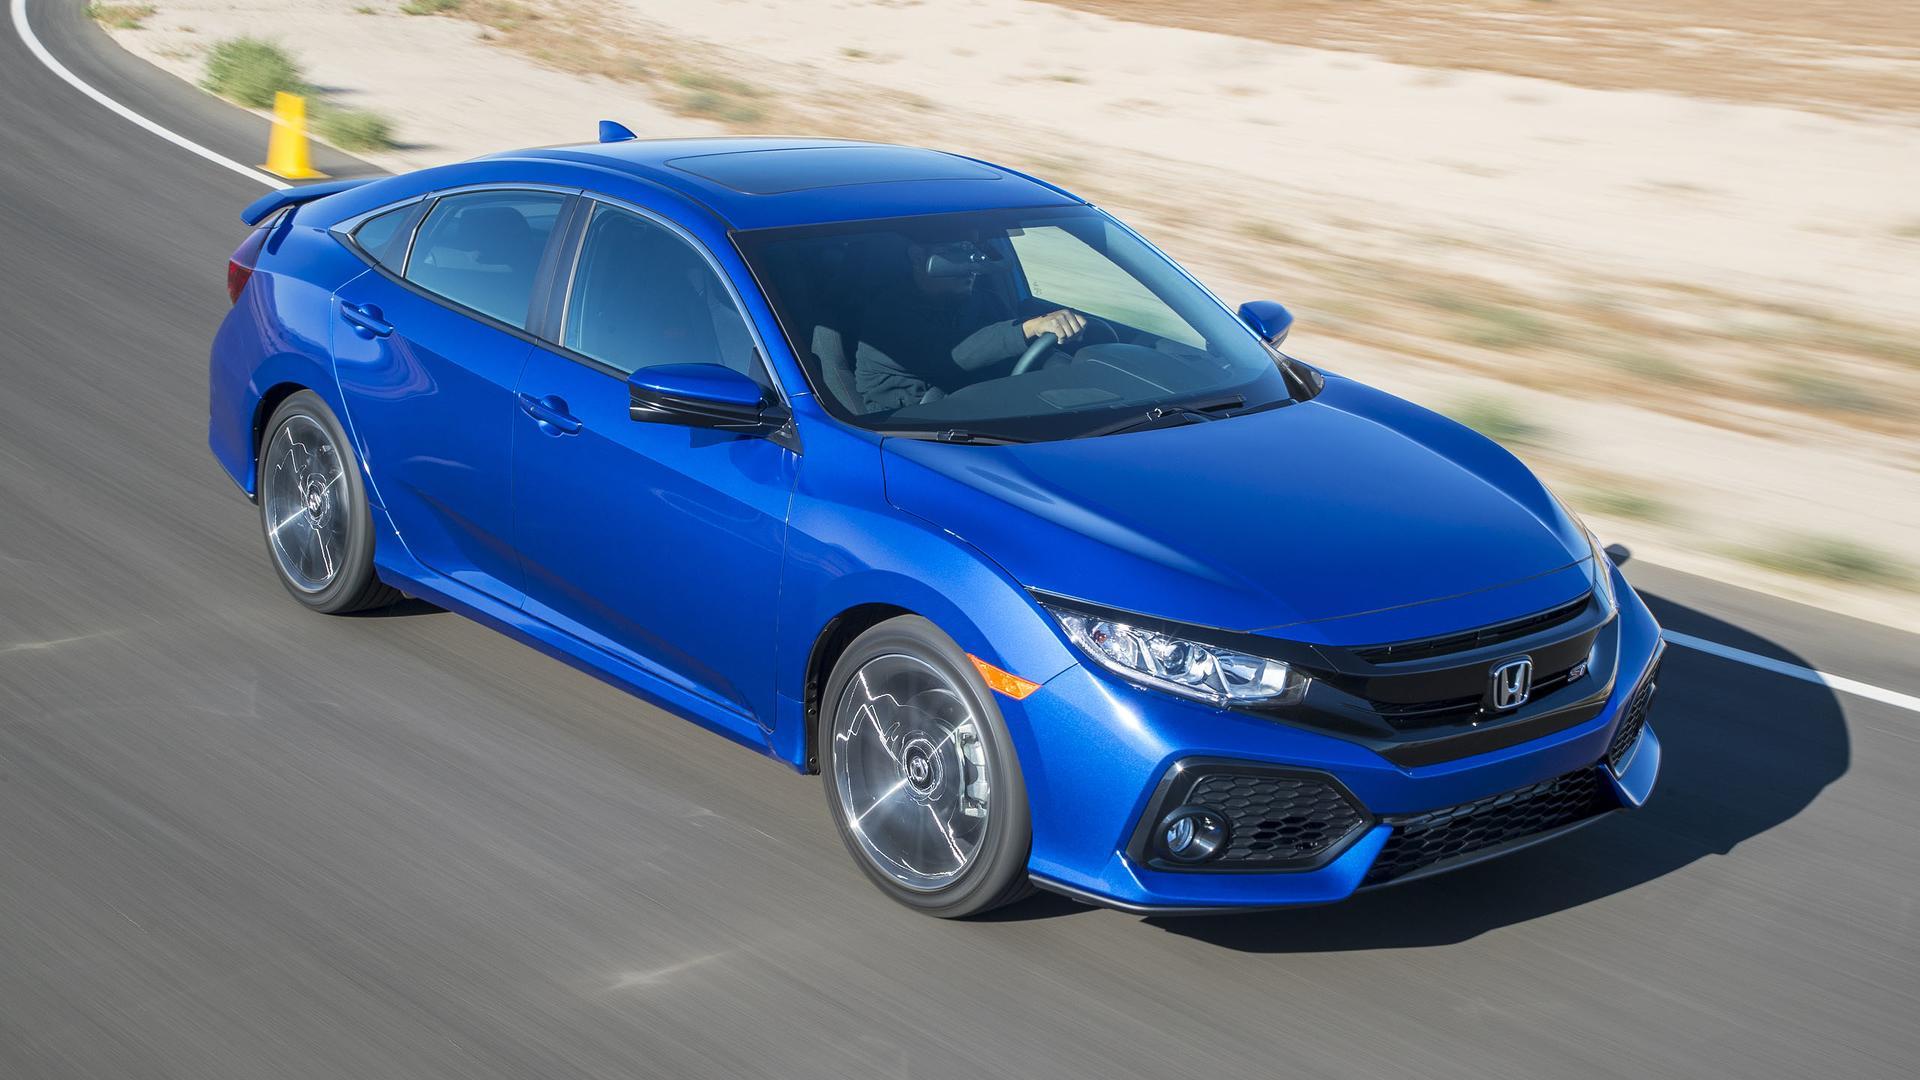 Honda Civic Si Horsepower >> Honda Civic Si Horsepower Capped In Favor Of Longevity